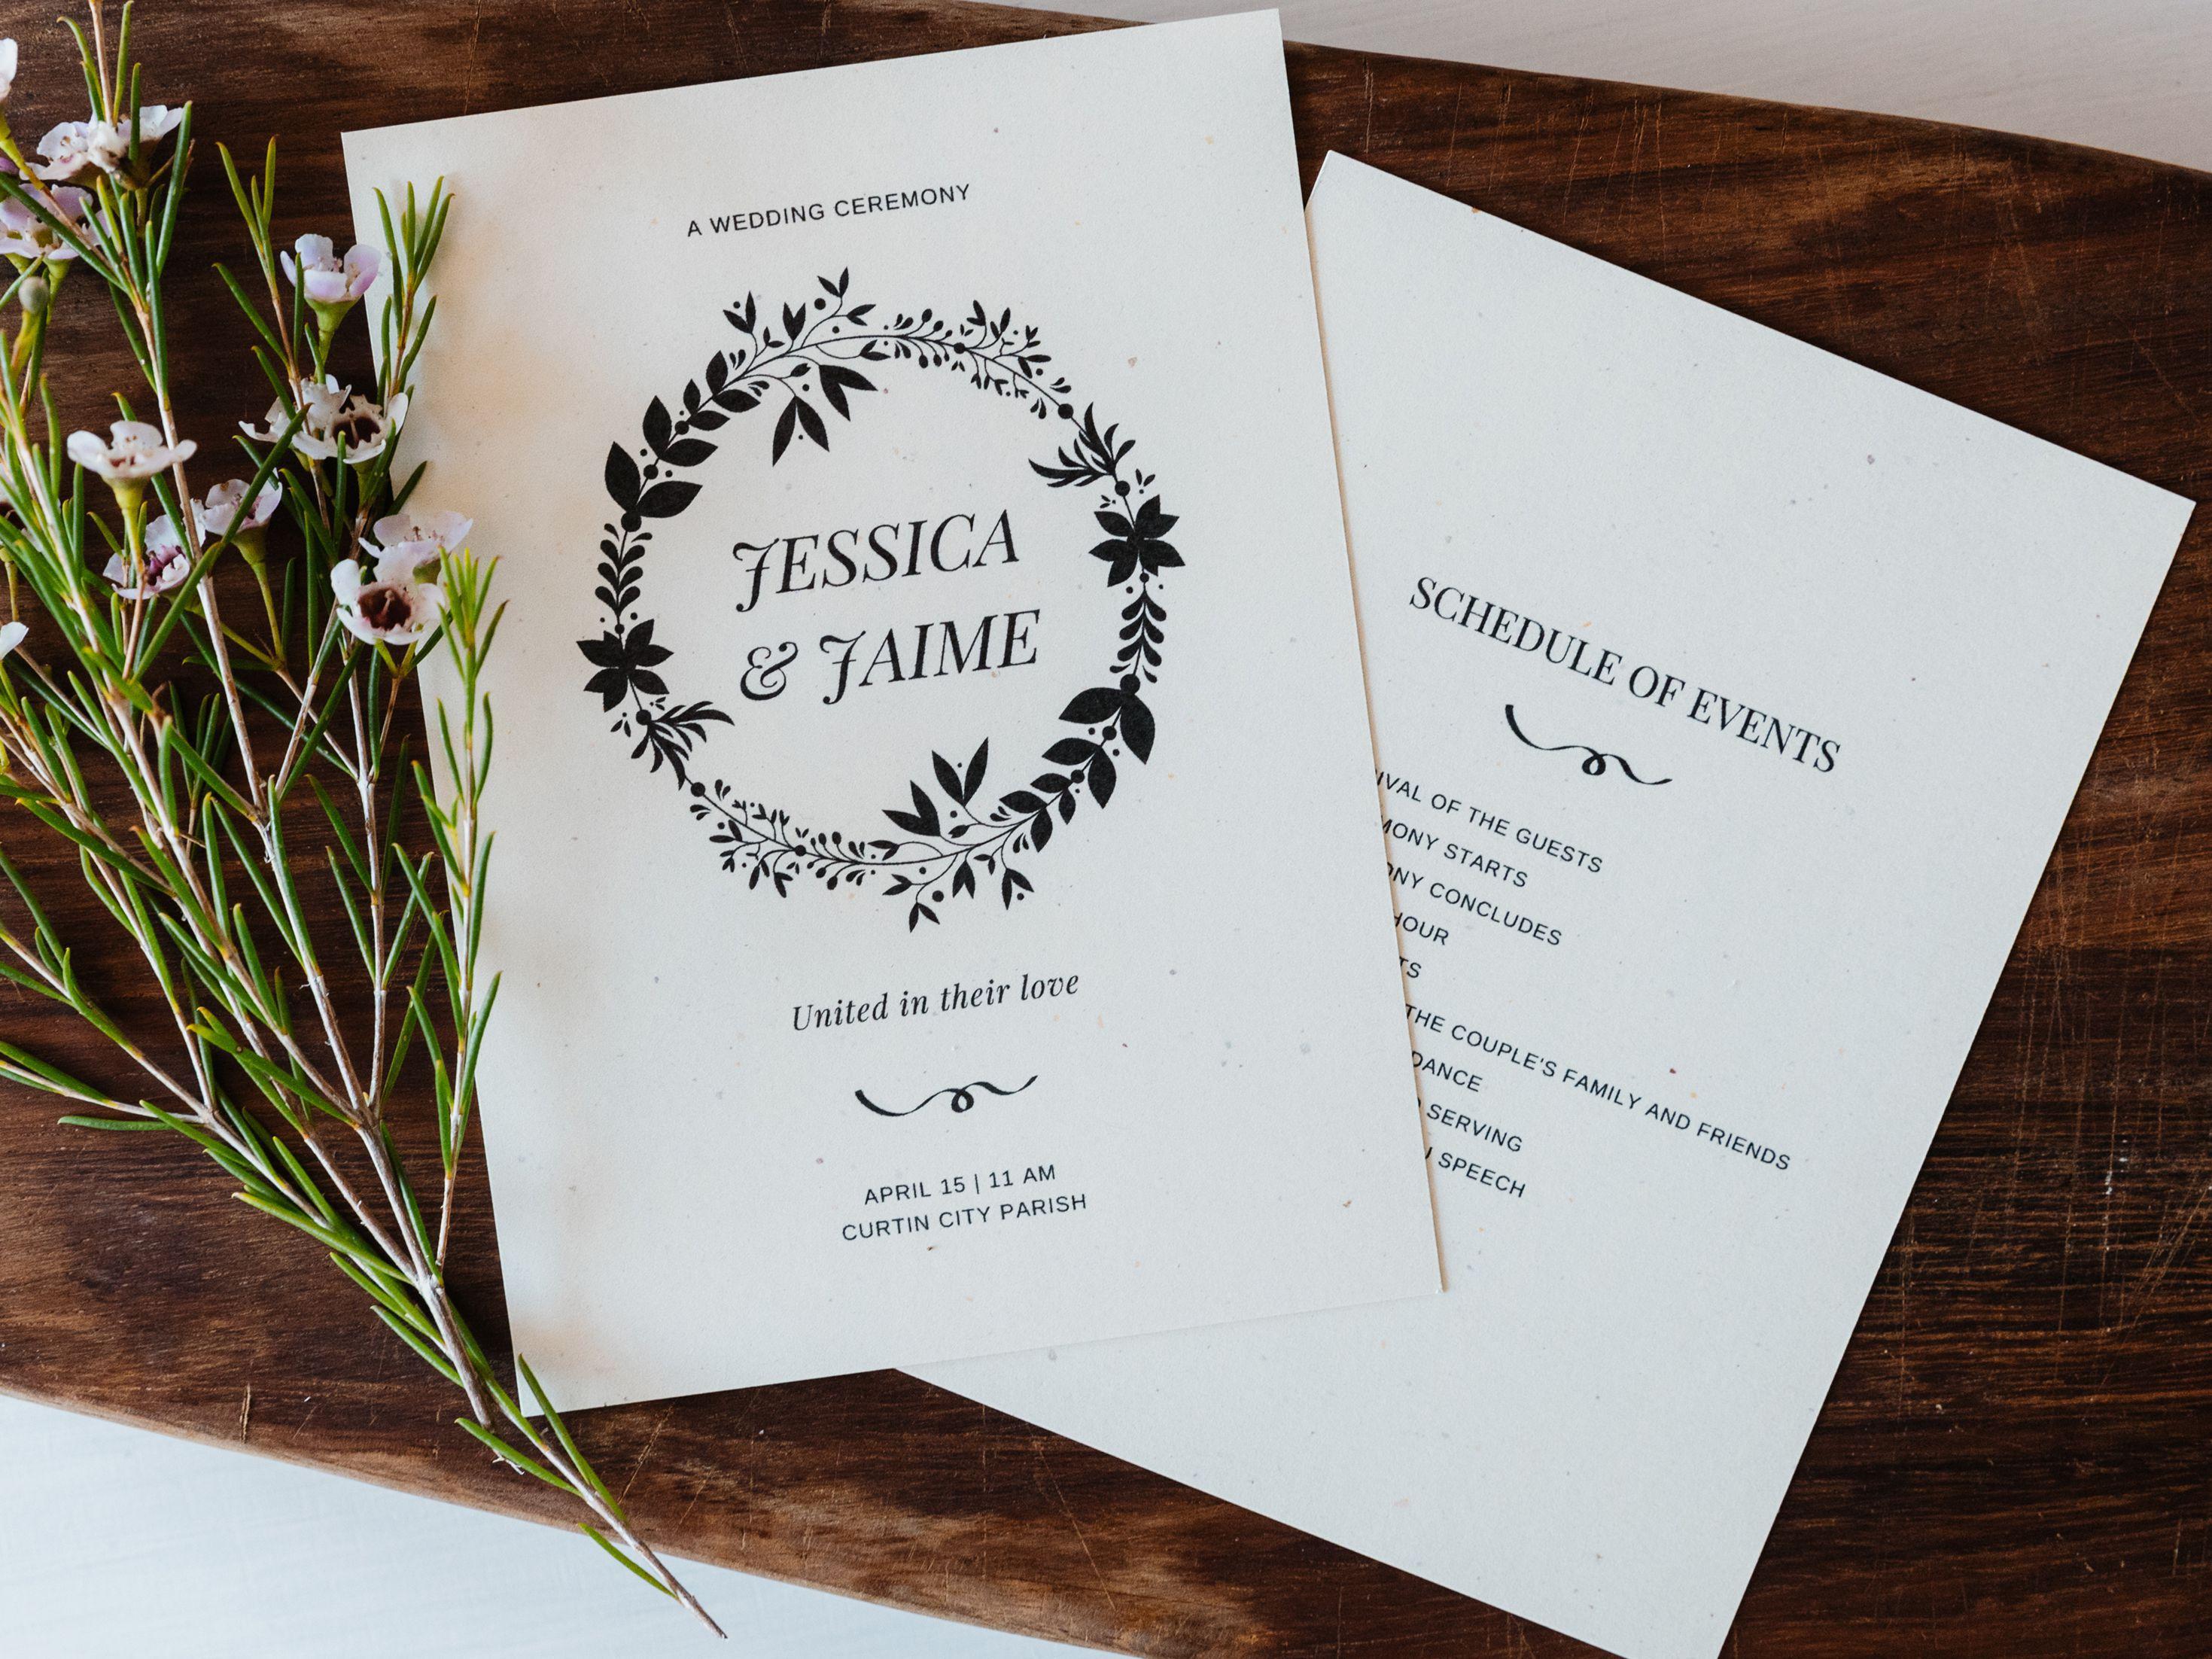 008 Fascinating Free Word Template For Wedding Program Inspiration  ProgramsFull